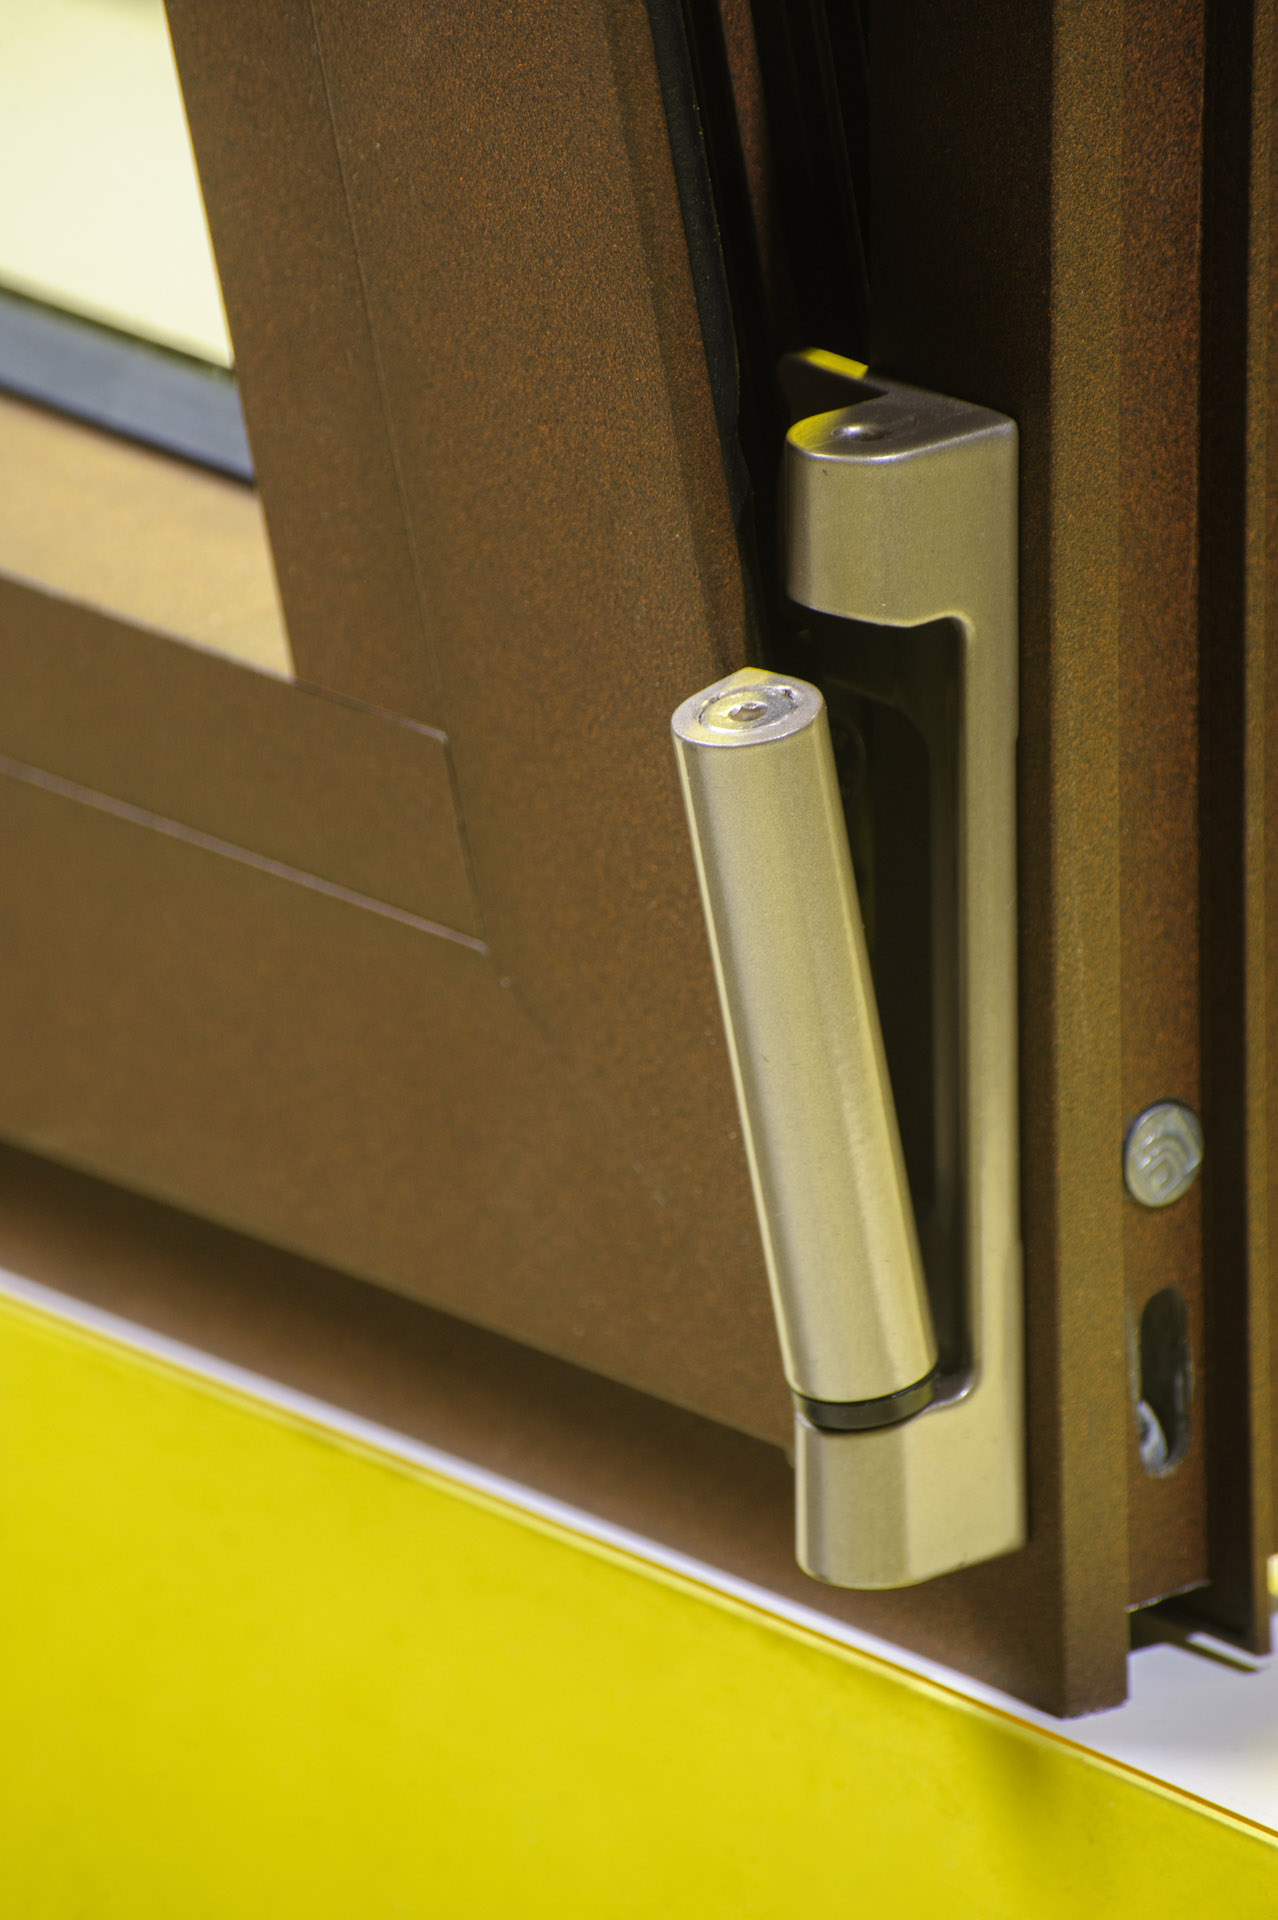 Bisagra de ventana oscilobatiente que se inclina hacia adelante y gira para apertura completa